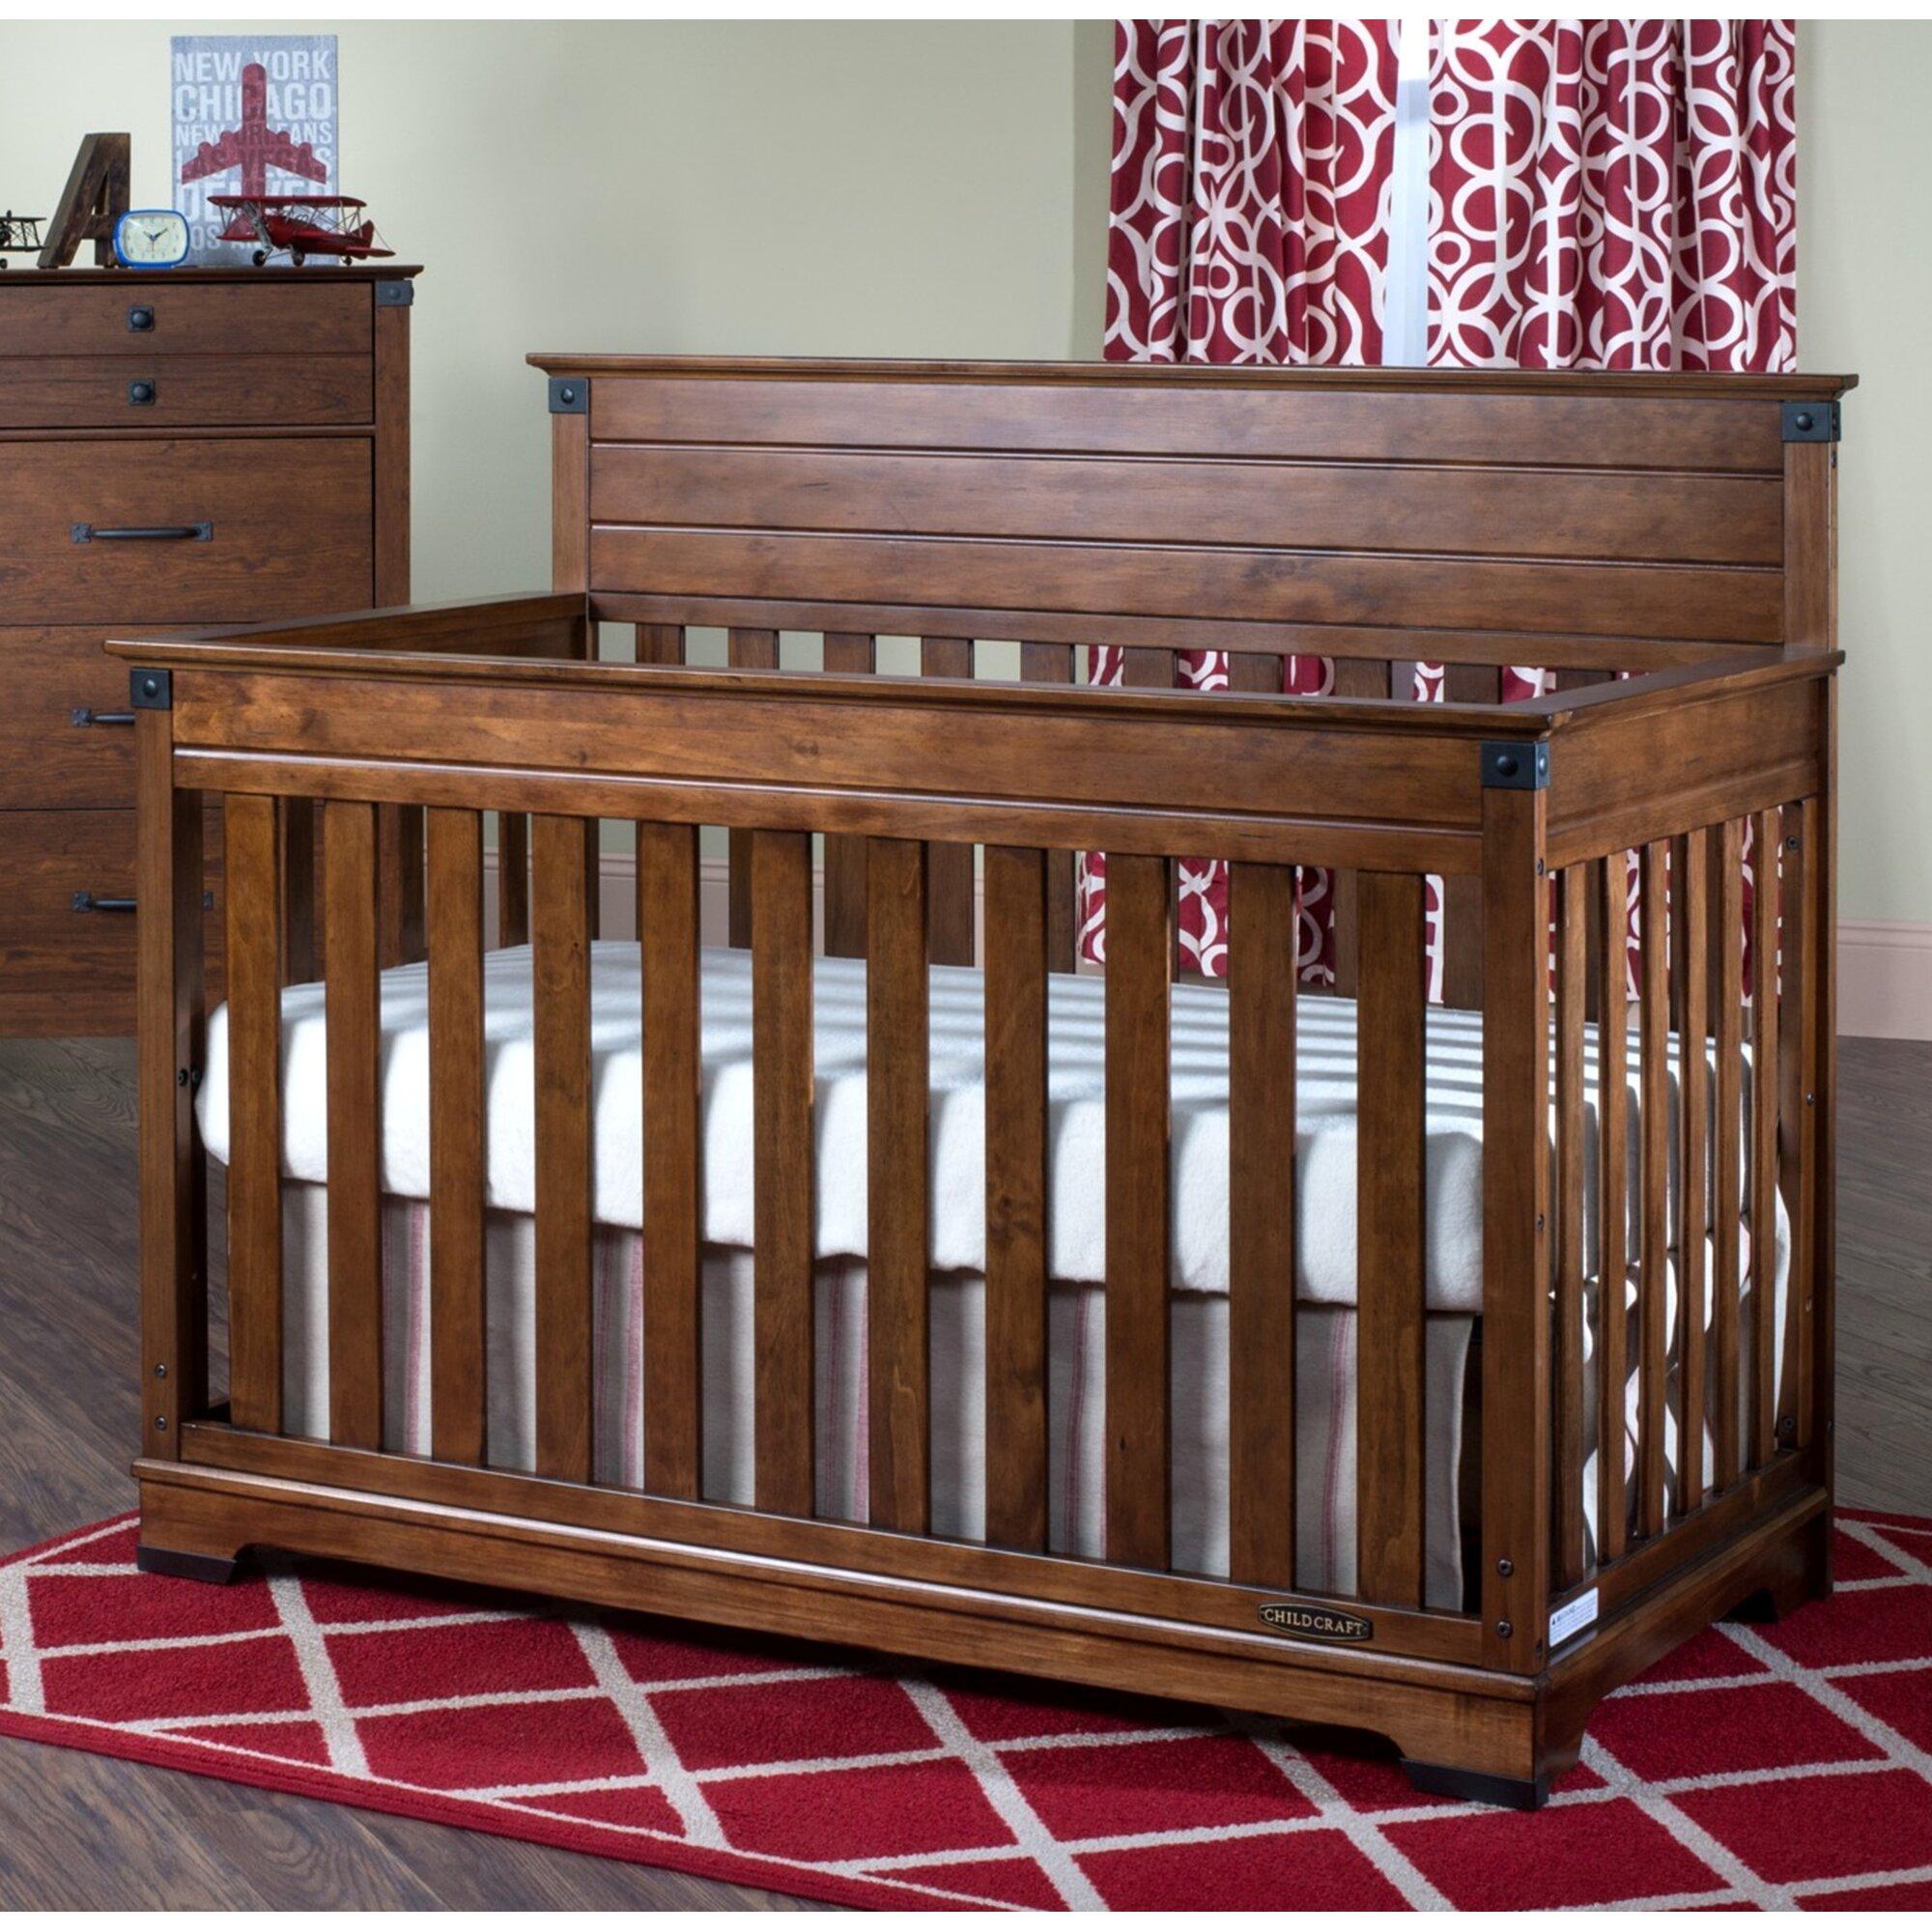 Crib for sale sulit com - Redmond Convertible Crib